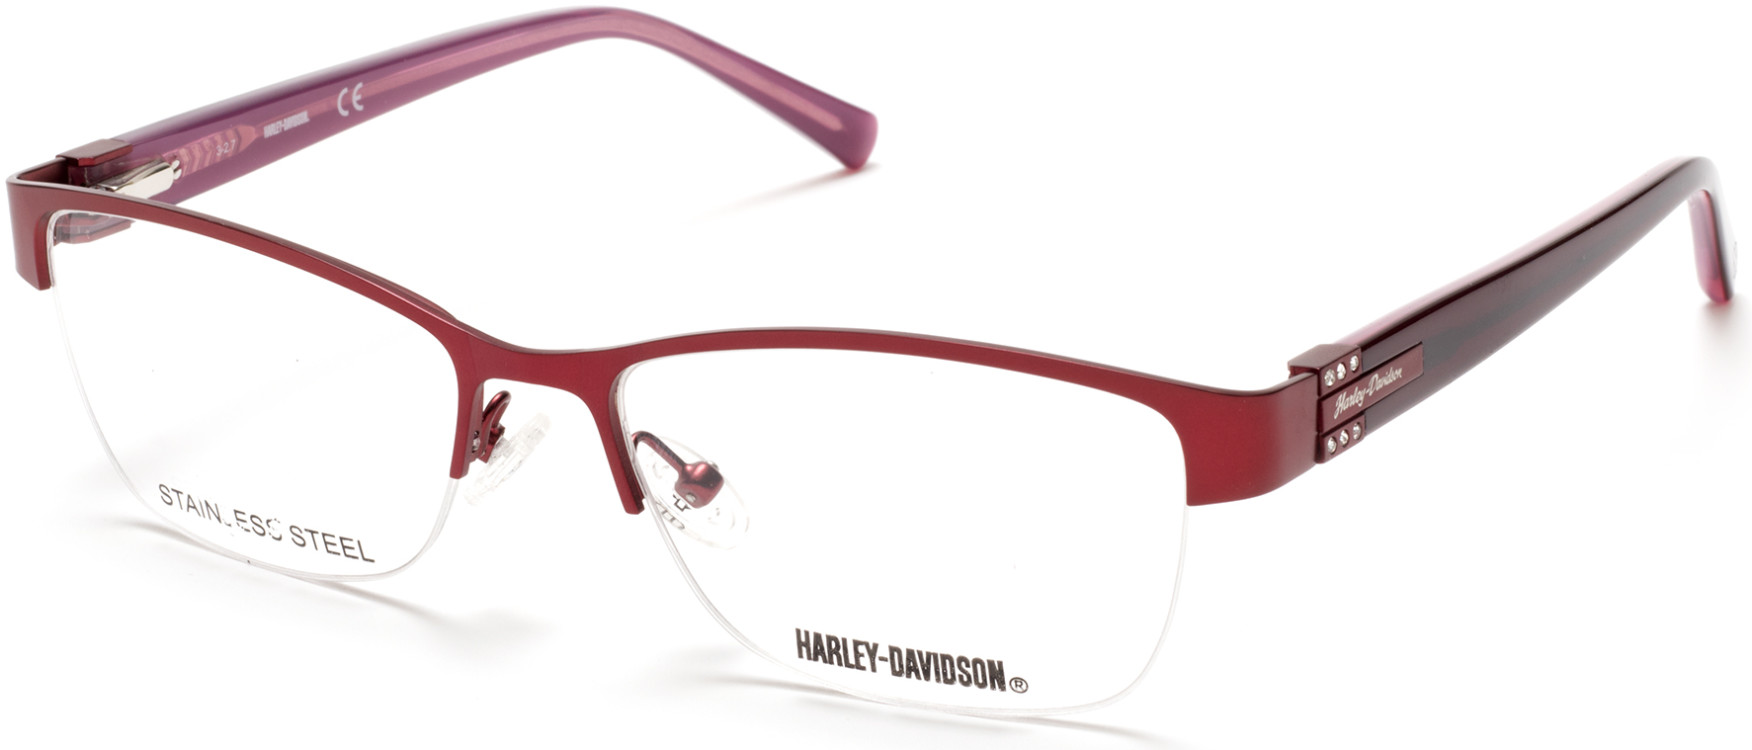 1e0197e404d Harley Davidson Eyewear HD0545 Eyeglass Frames FREE S H HD054554002 ...